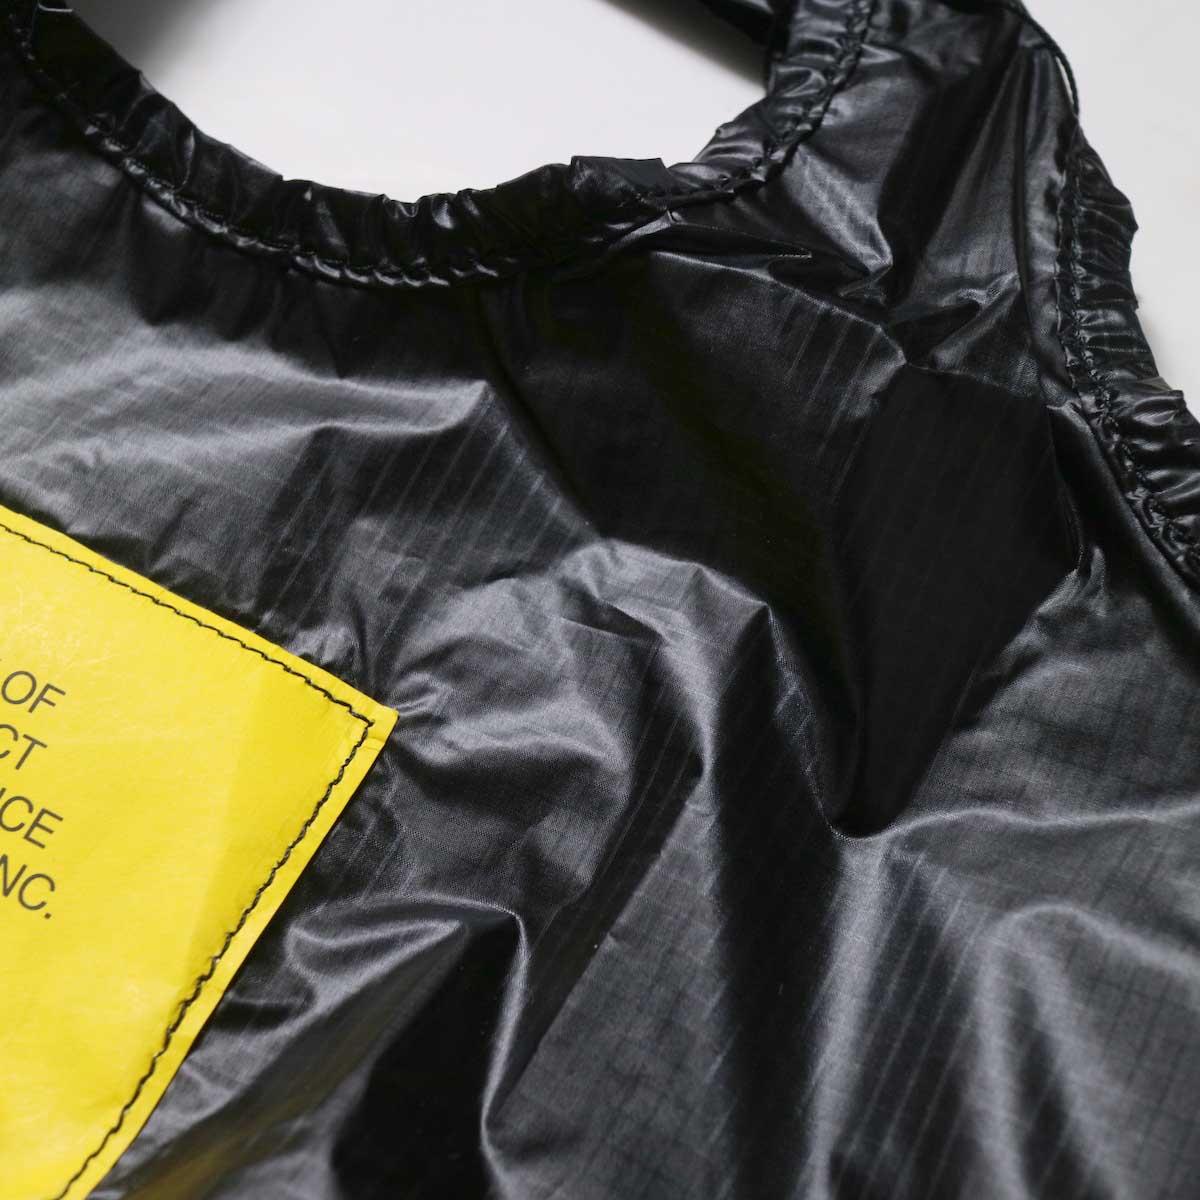 N.HOOLYWOOD / 9211-AC87 pieces BAG (SMALL) 生地感